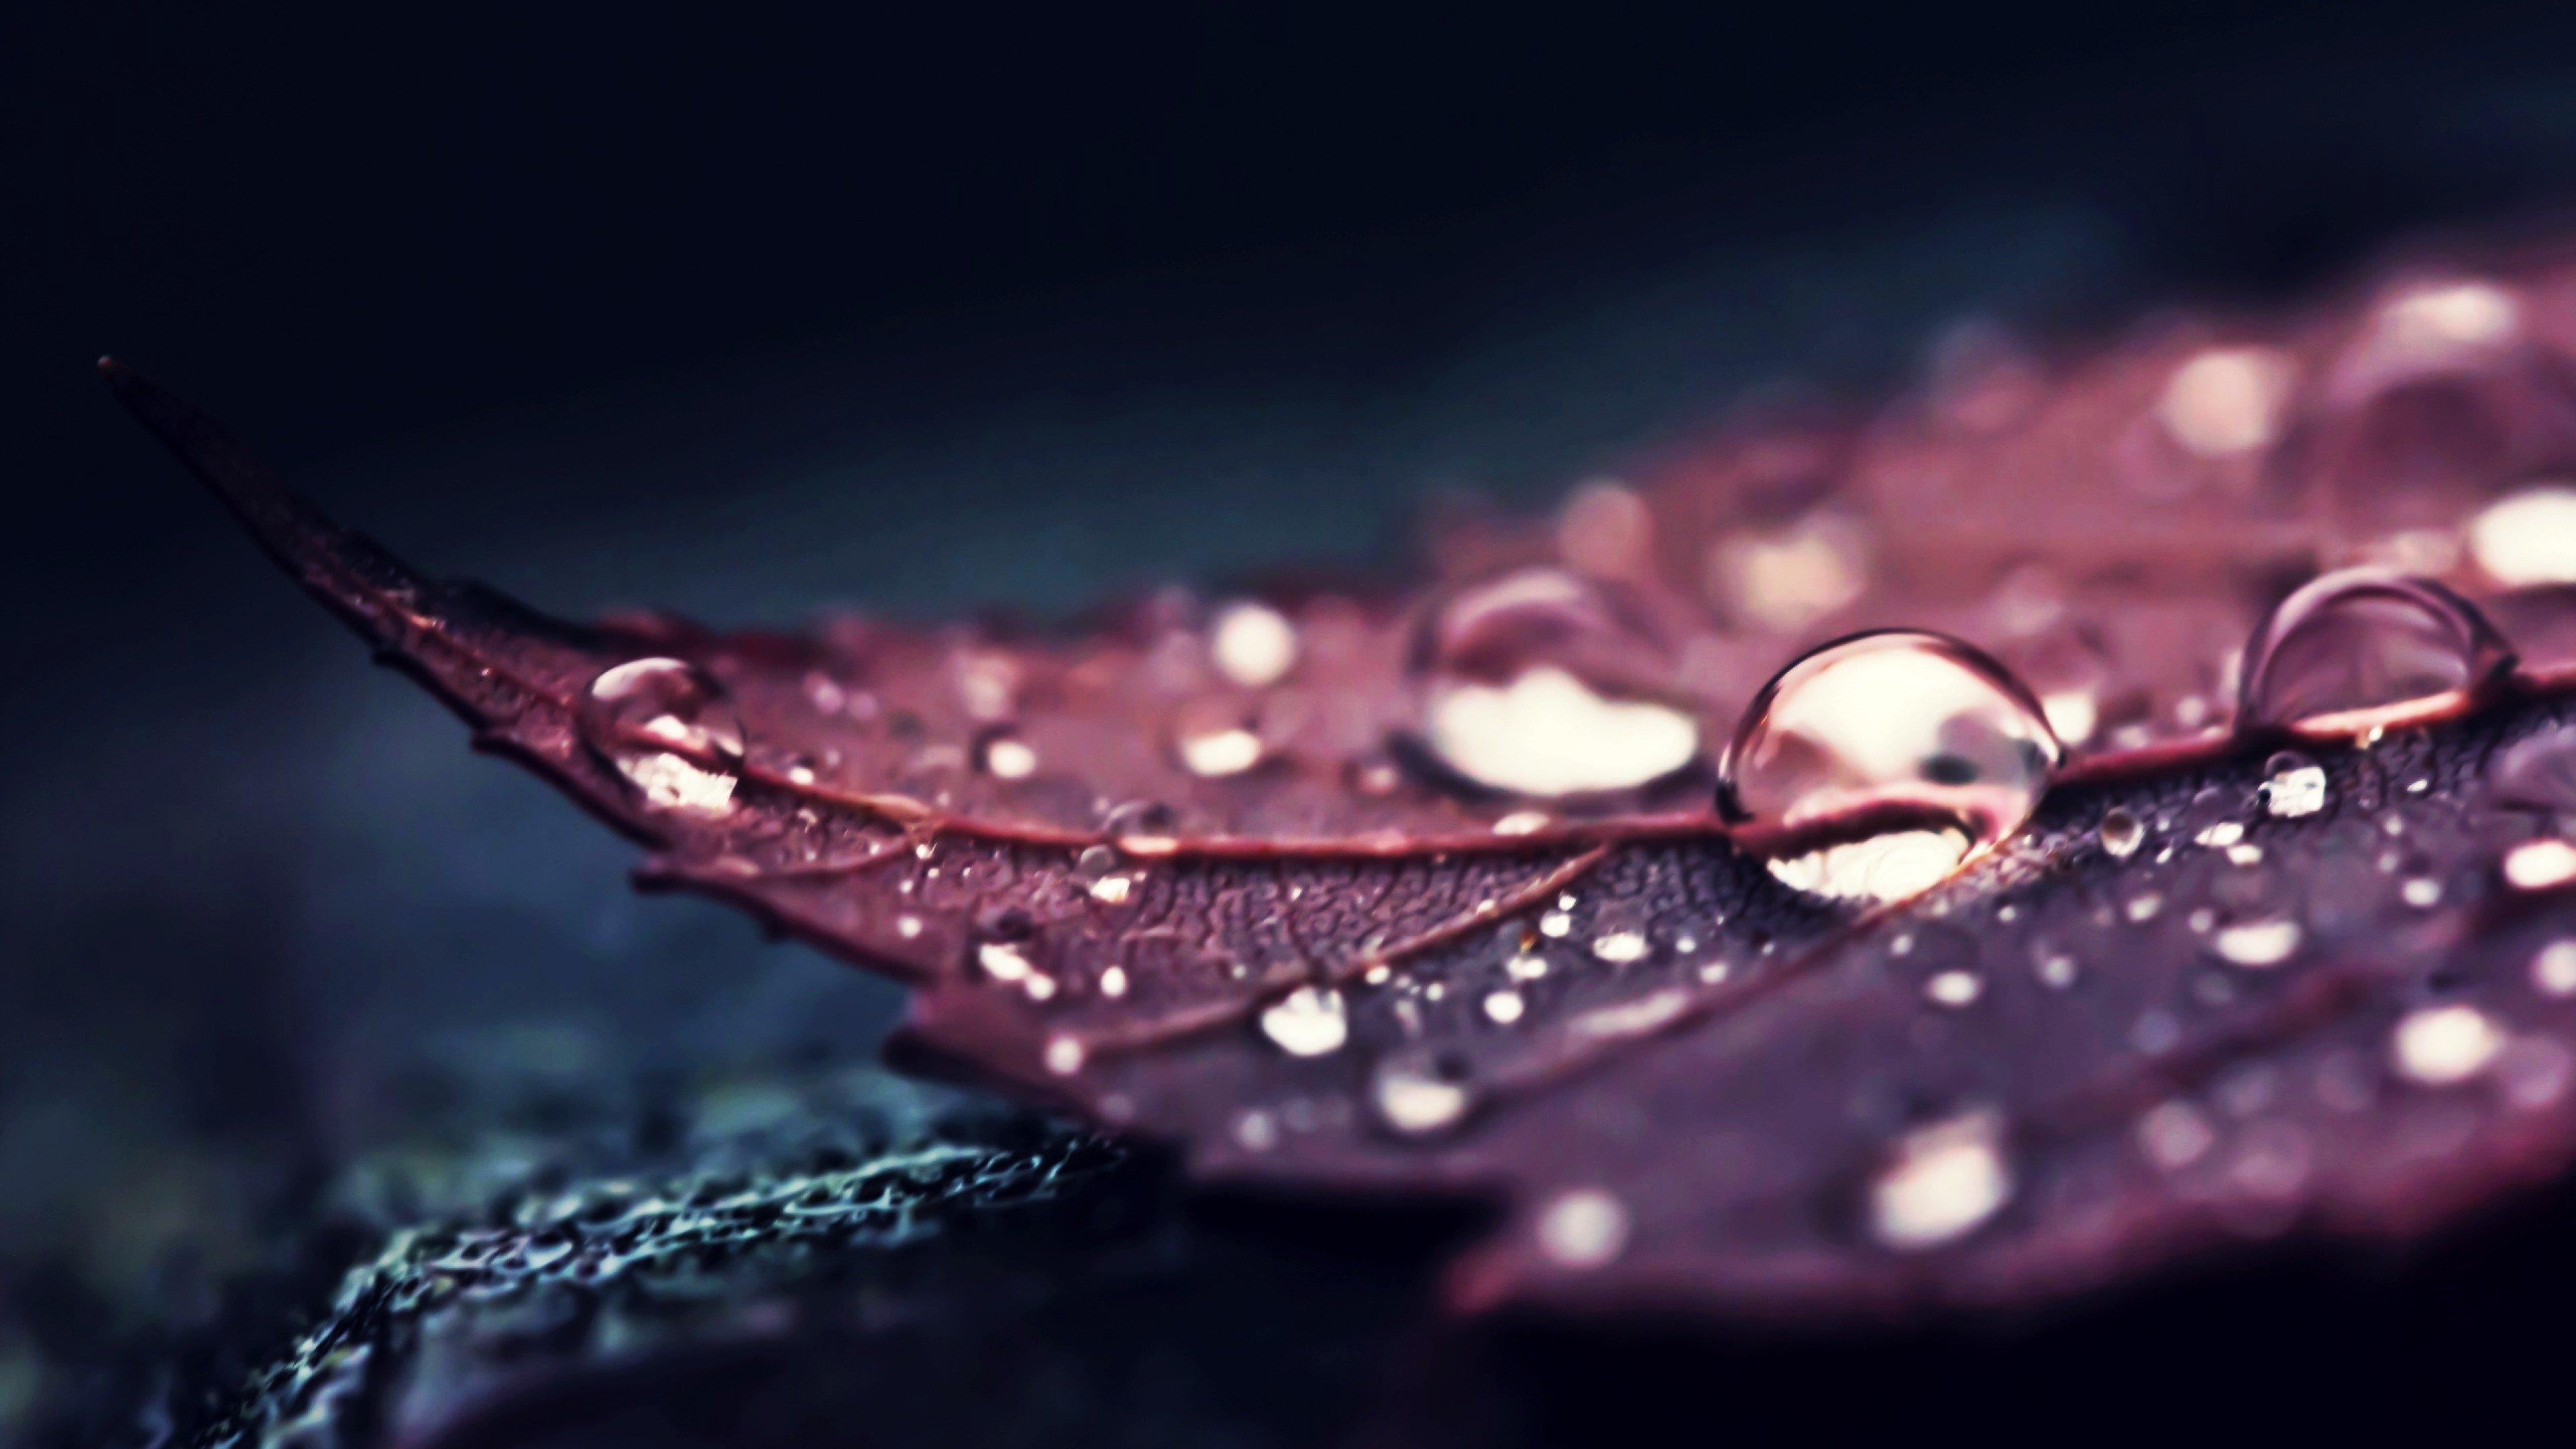 Macro Wallpapers For Mobile Phones: Nature, Leaves, Water, Macro, Water Drops HD Wallpapers